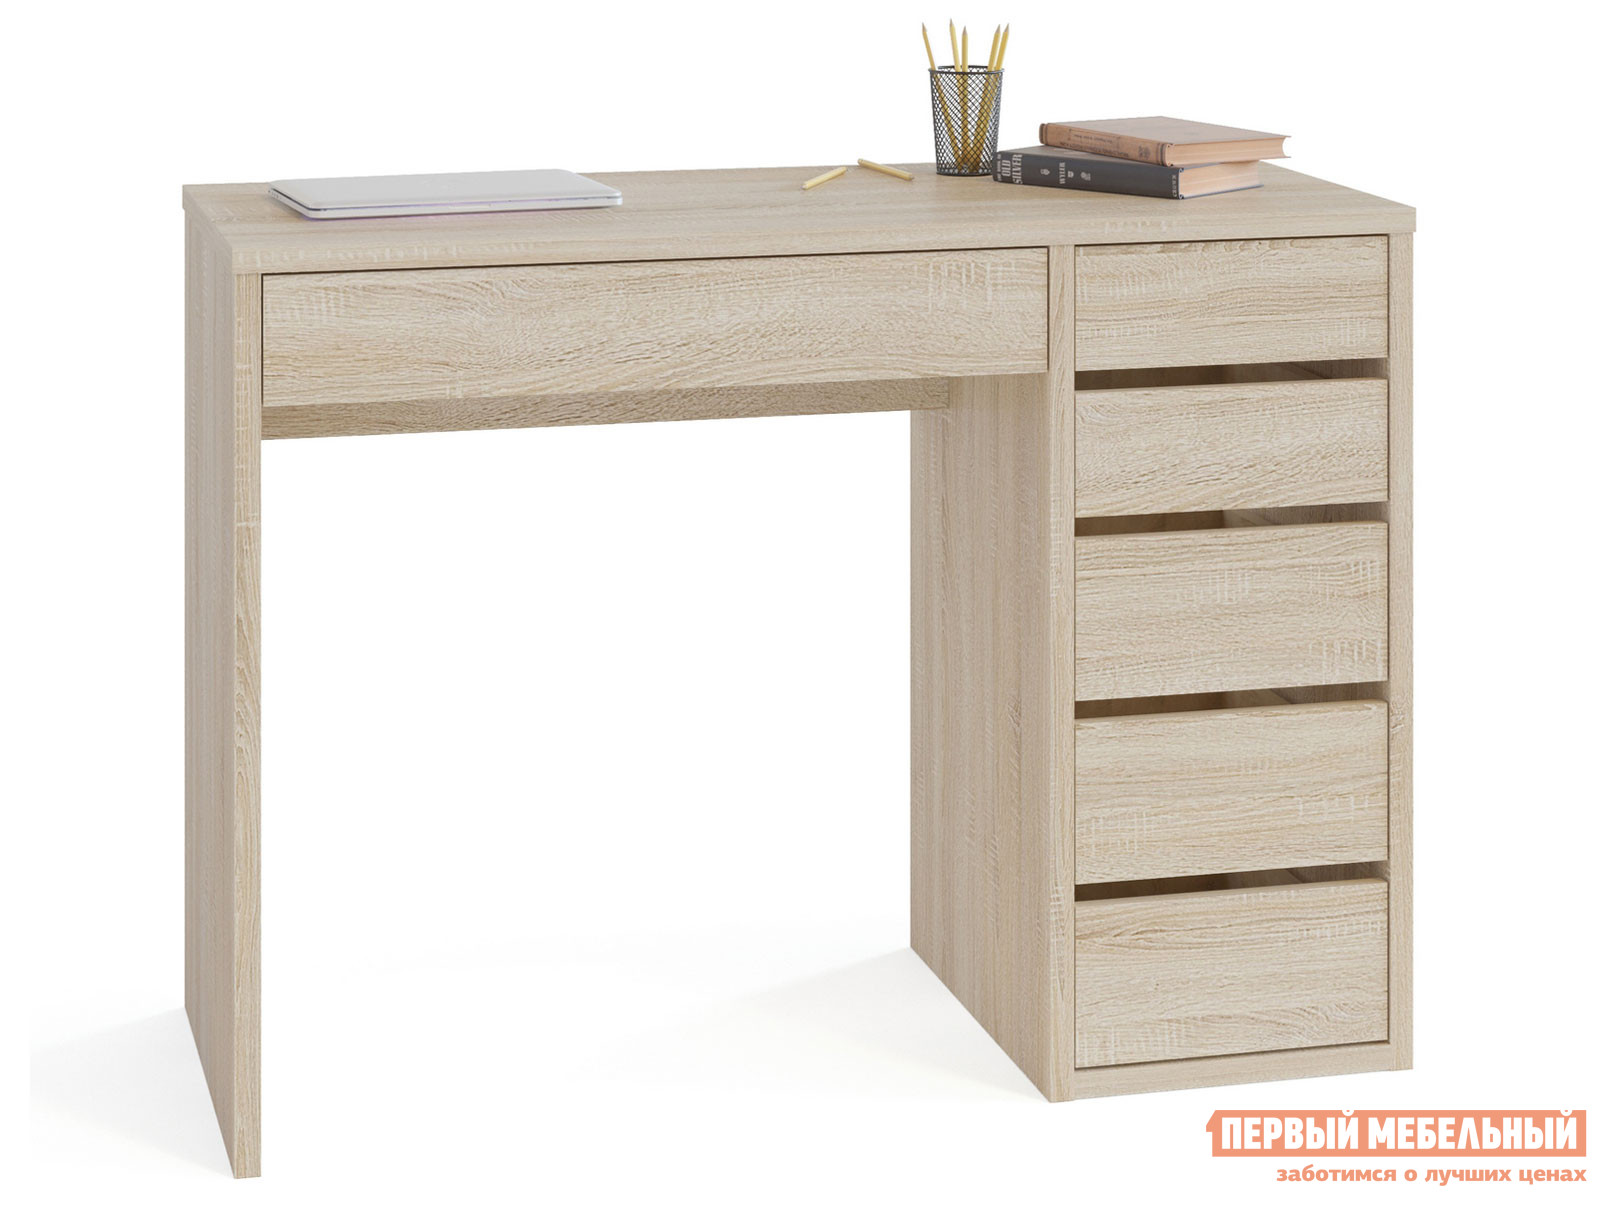 Письменный стол Тайга СПм-10